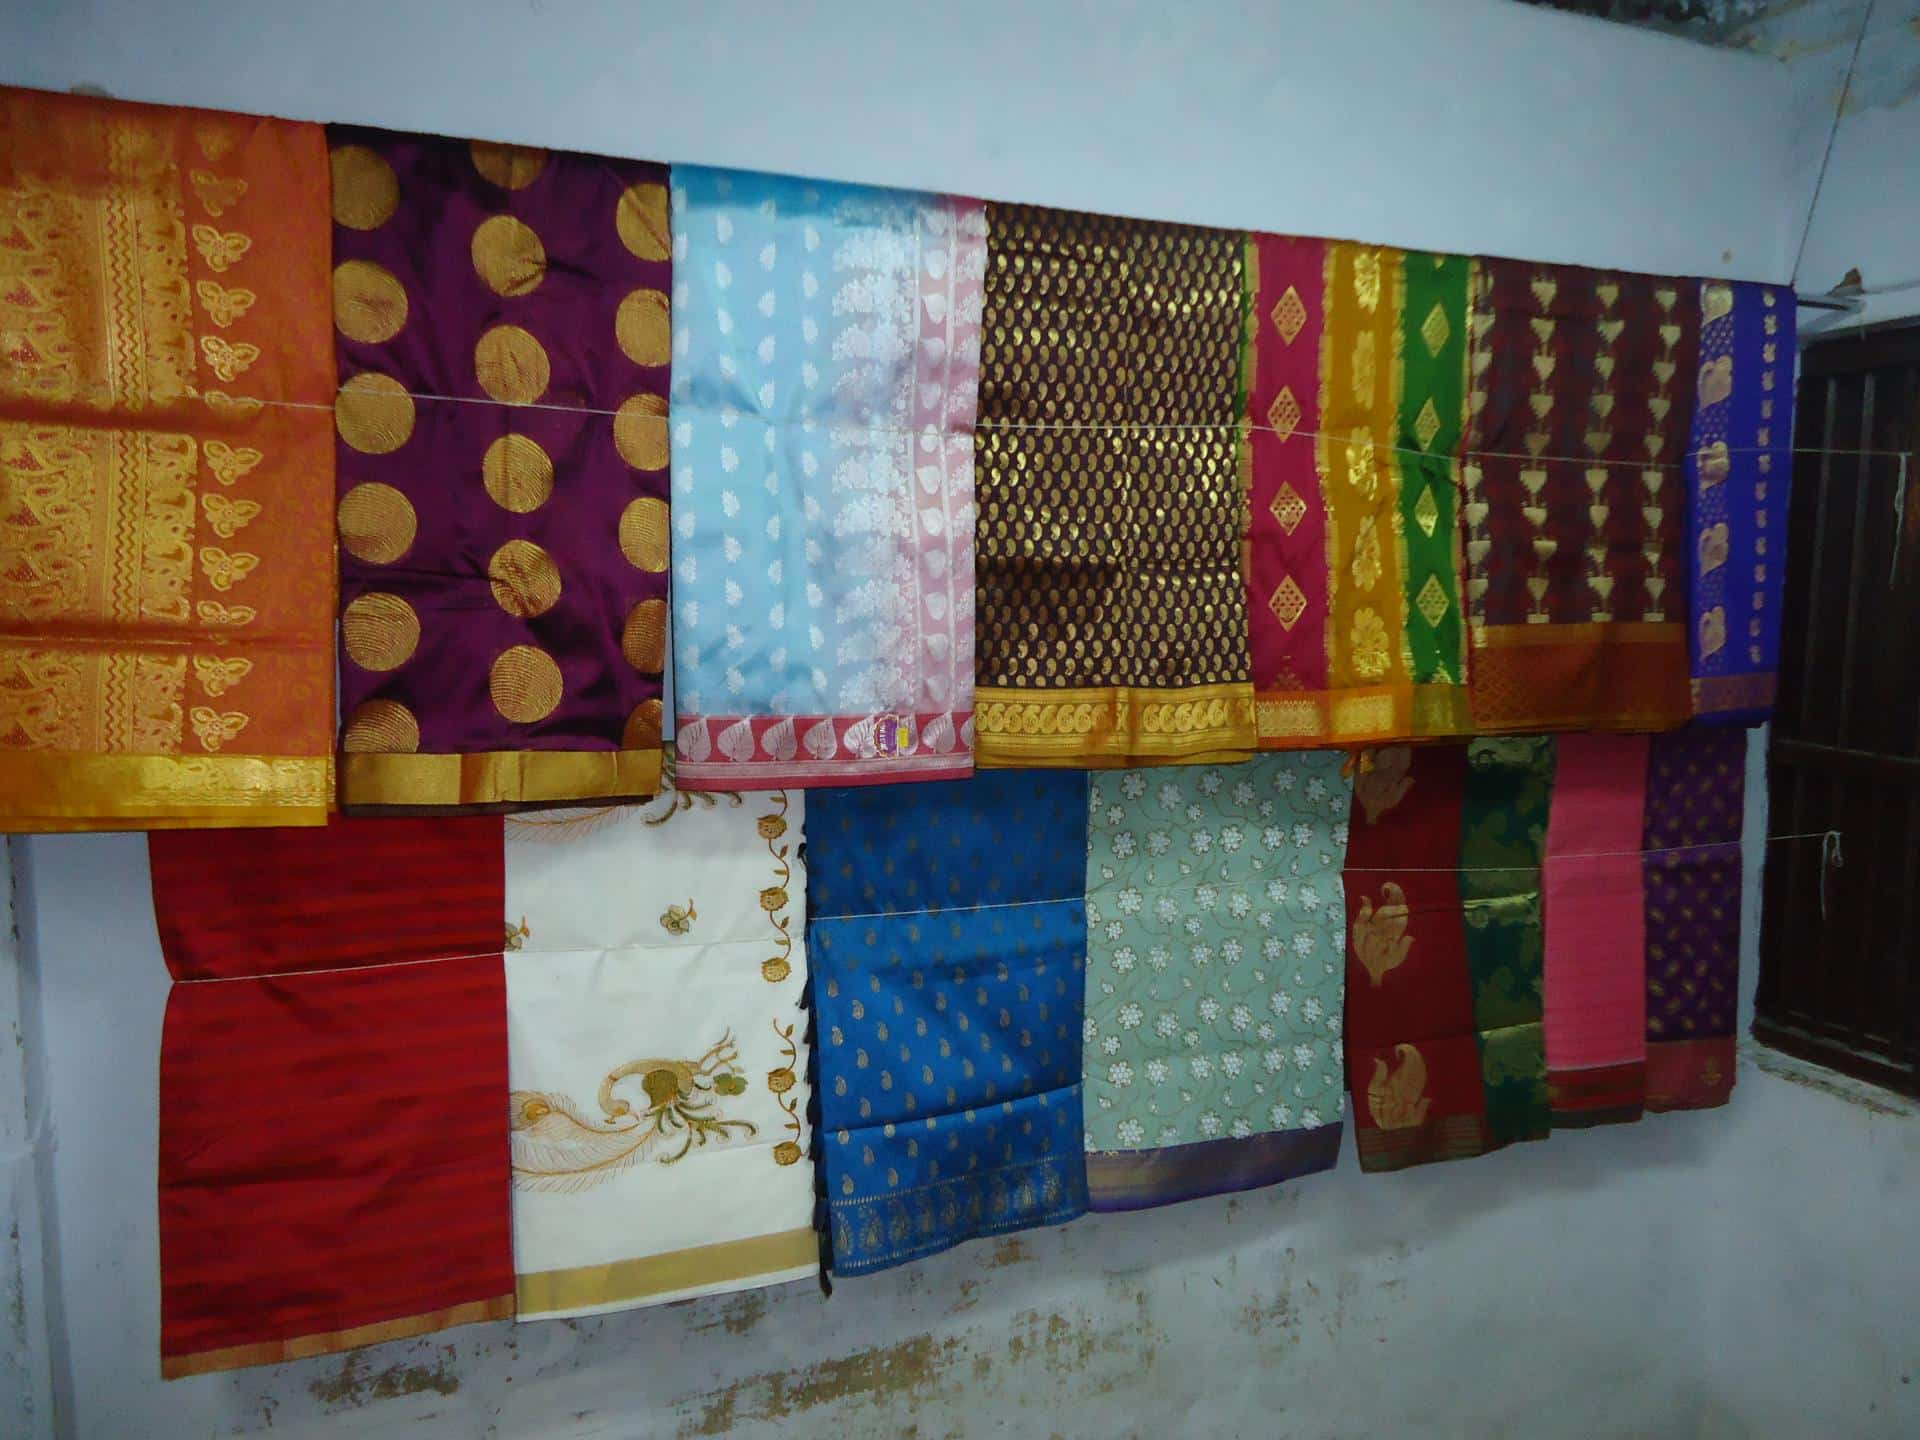 Temple of Tamilnadu Tour from Chennai 7